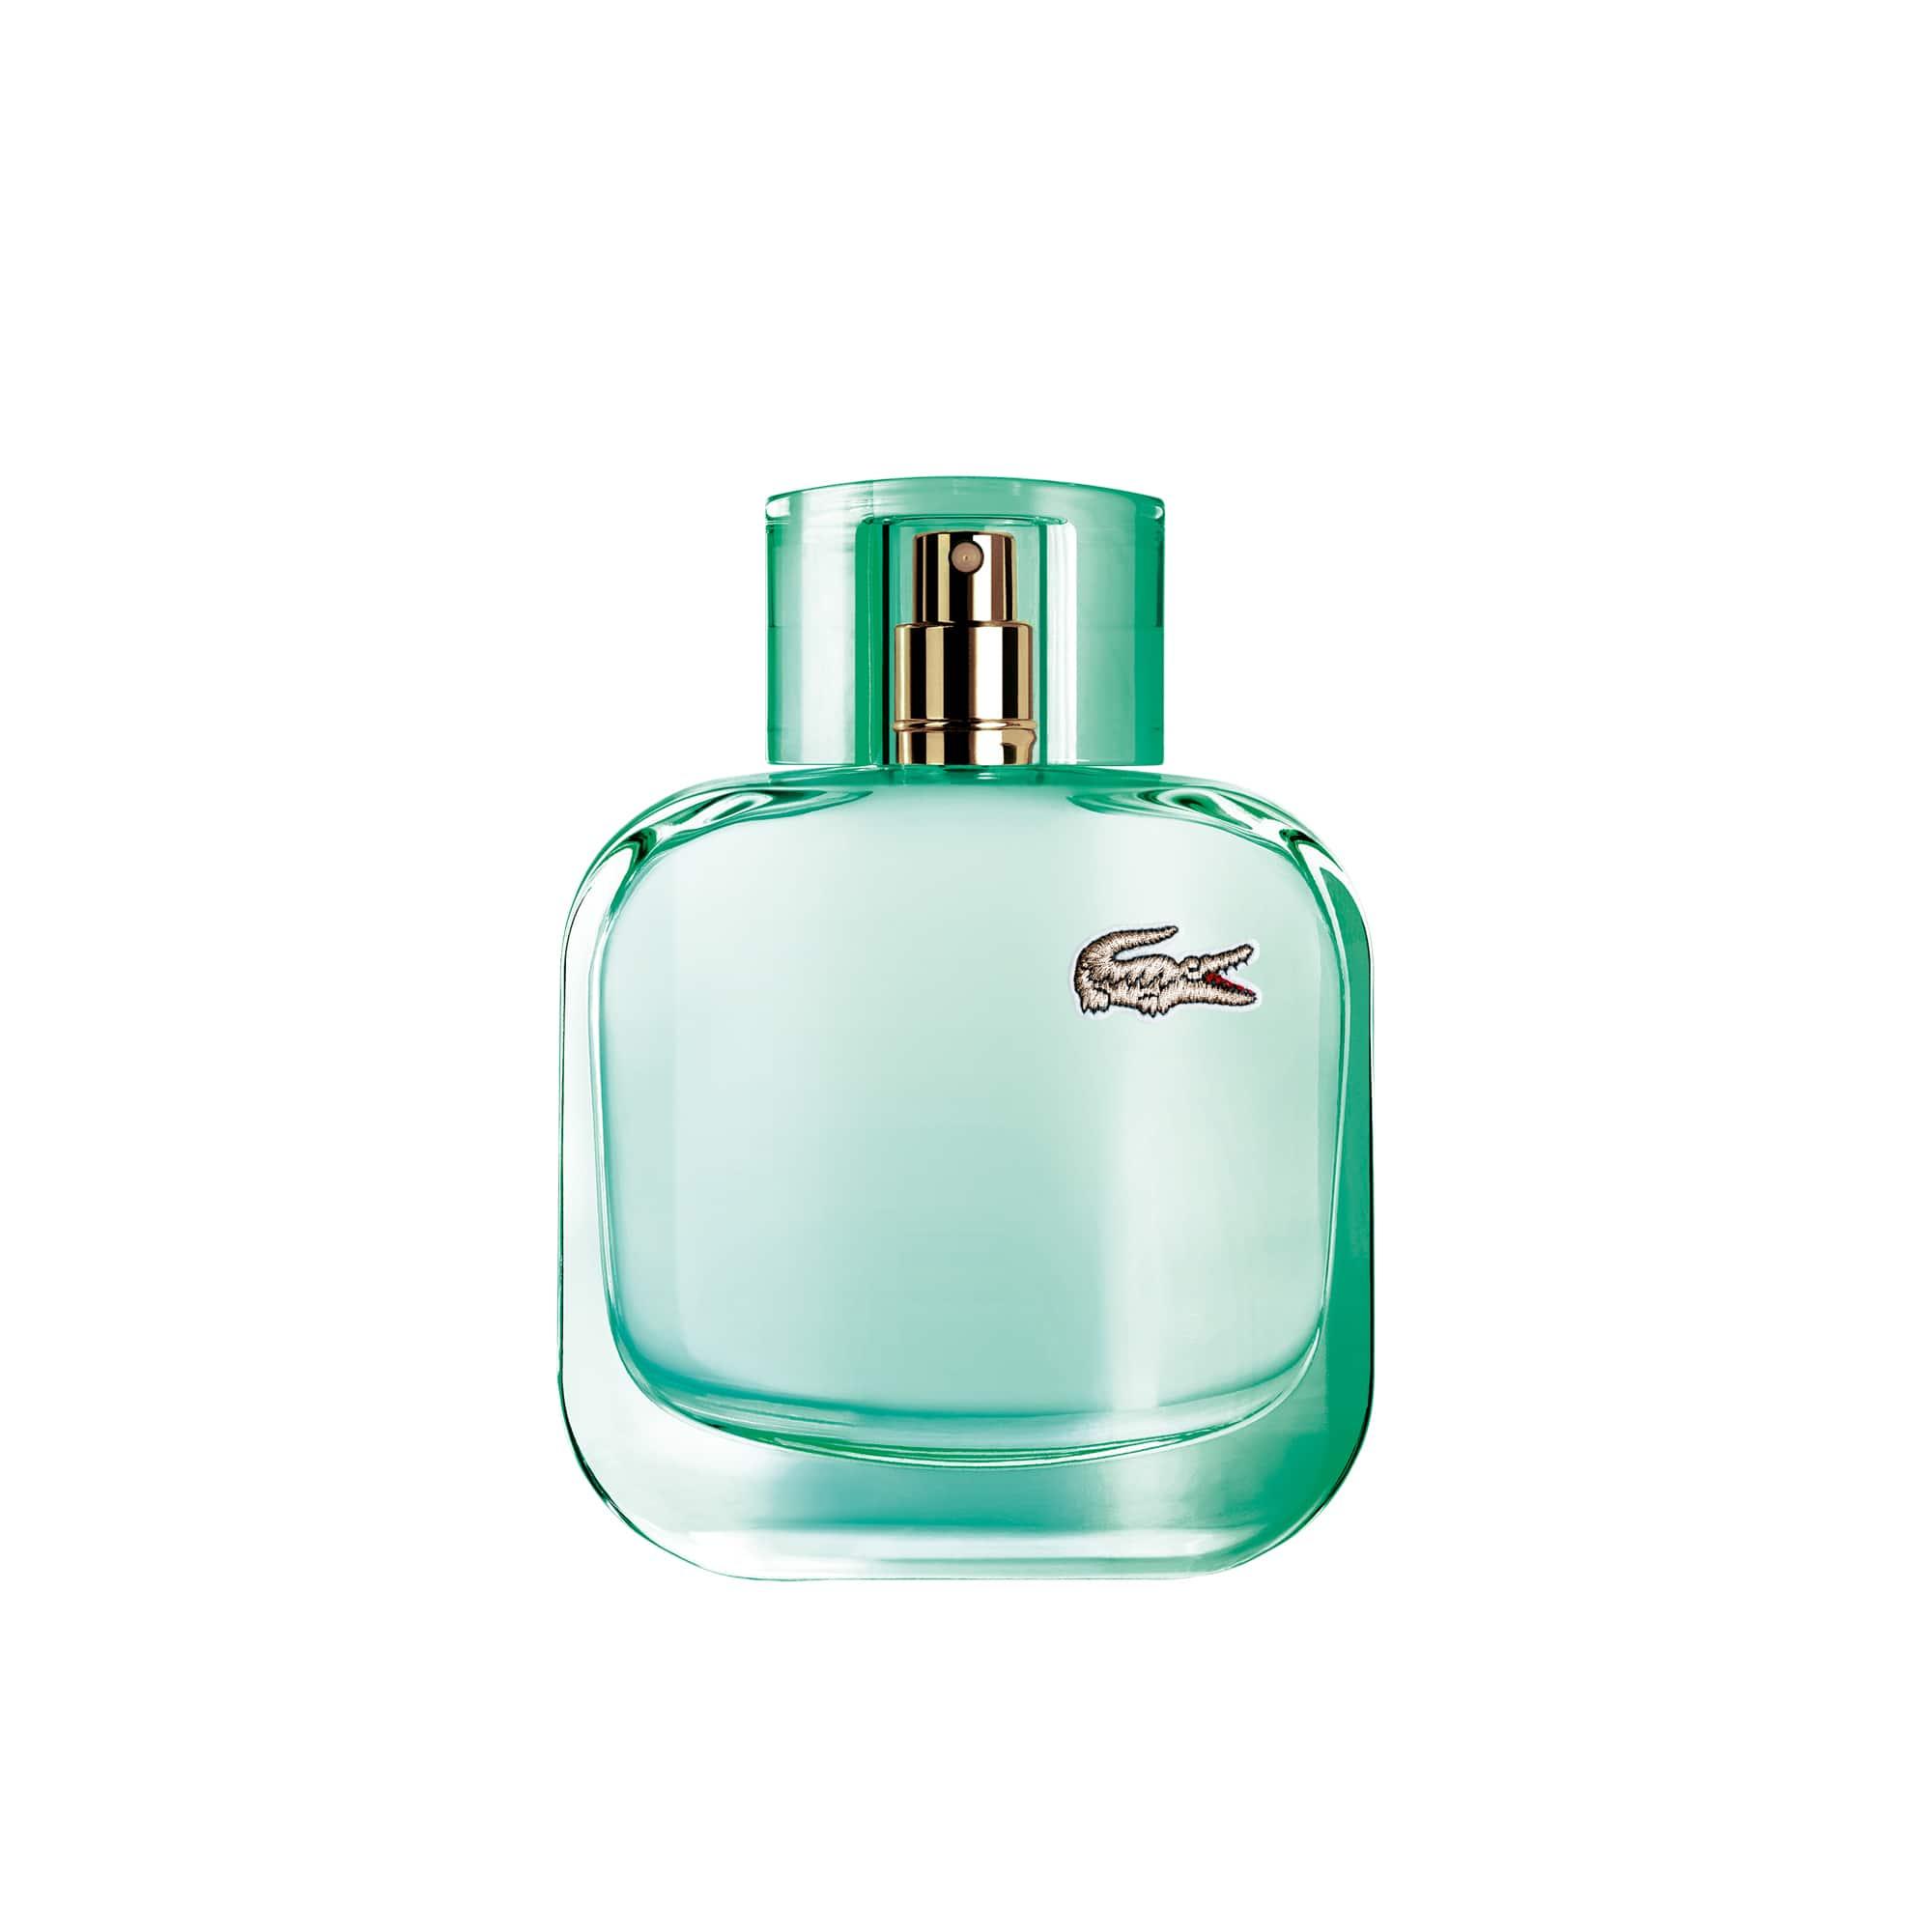 Parfums Parfums L1212Lacoste L1212Lacoste L1212Lacoste Parfums Parfums Parfums L1212Lacoste Parfums L1212Lacoste L1212Lacoste Parfums c3lFK1uTJ